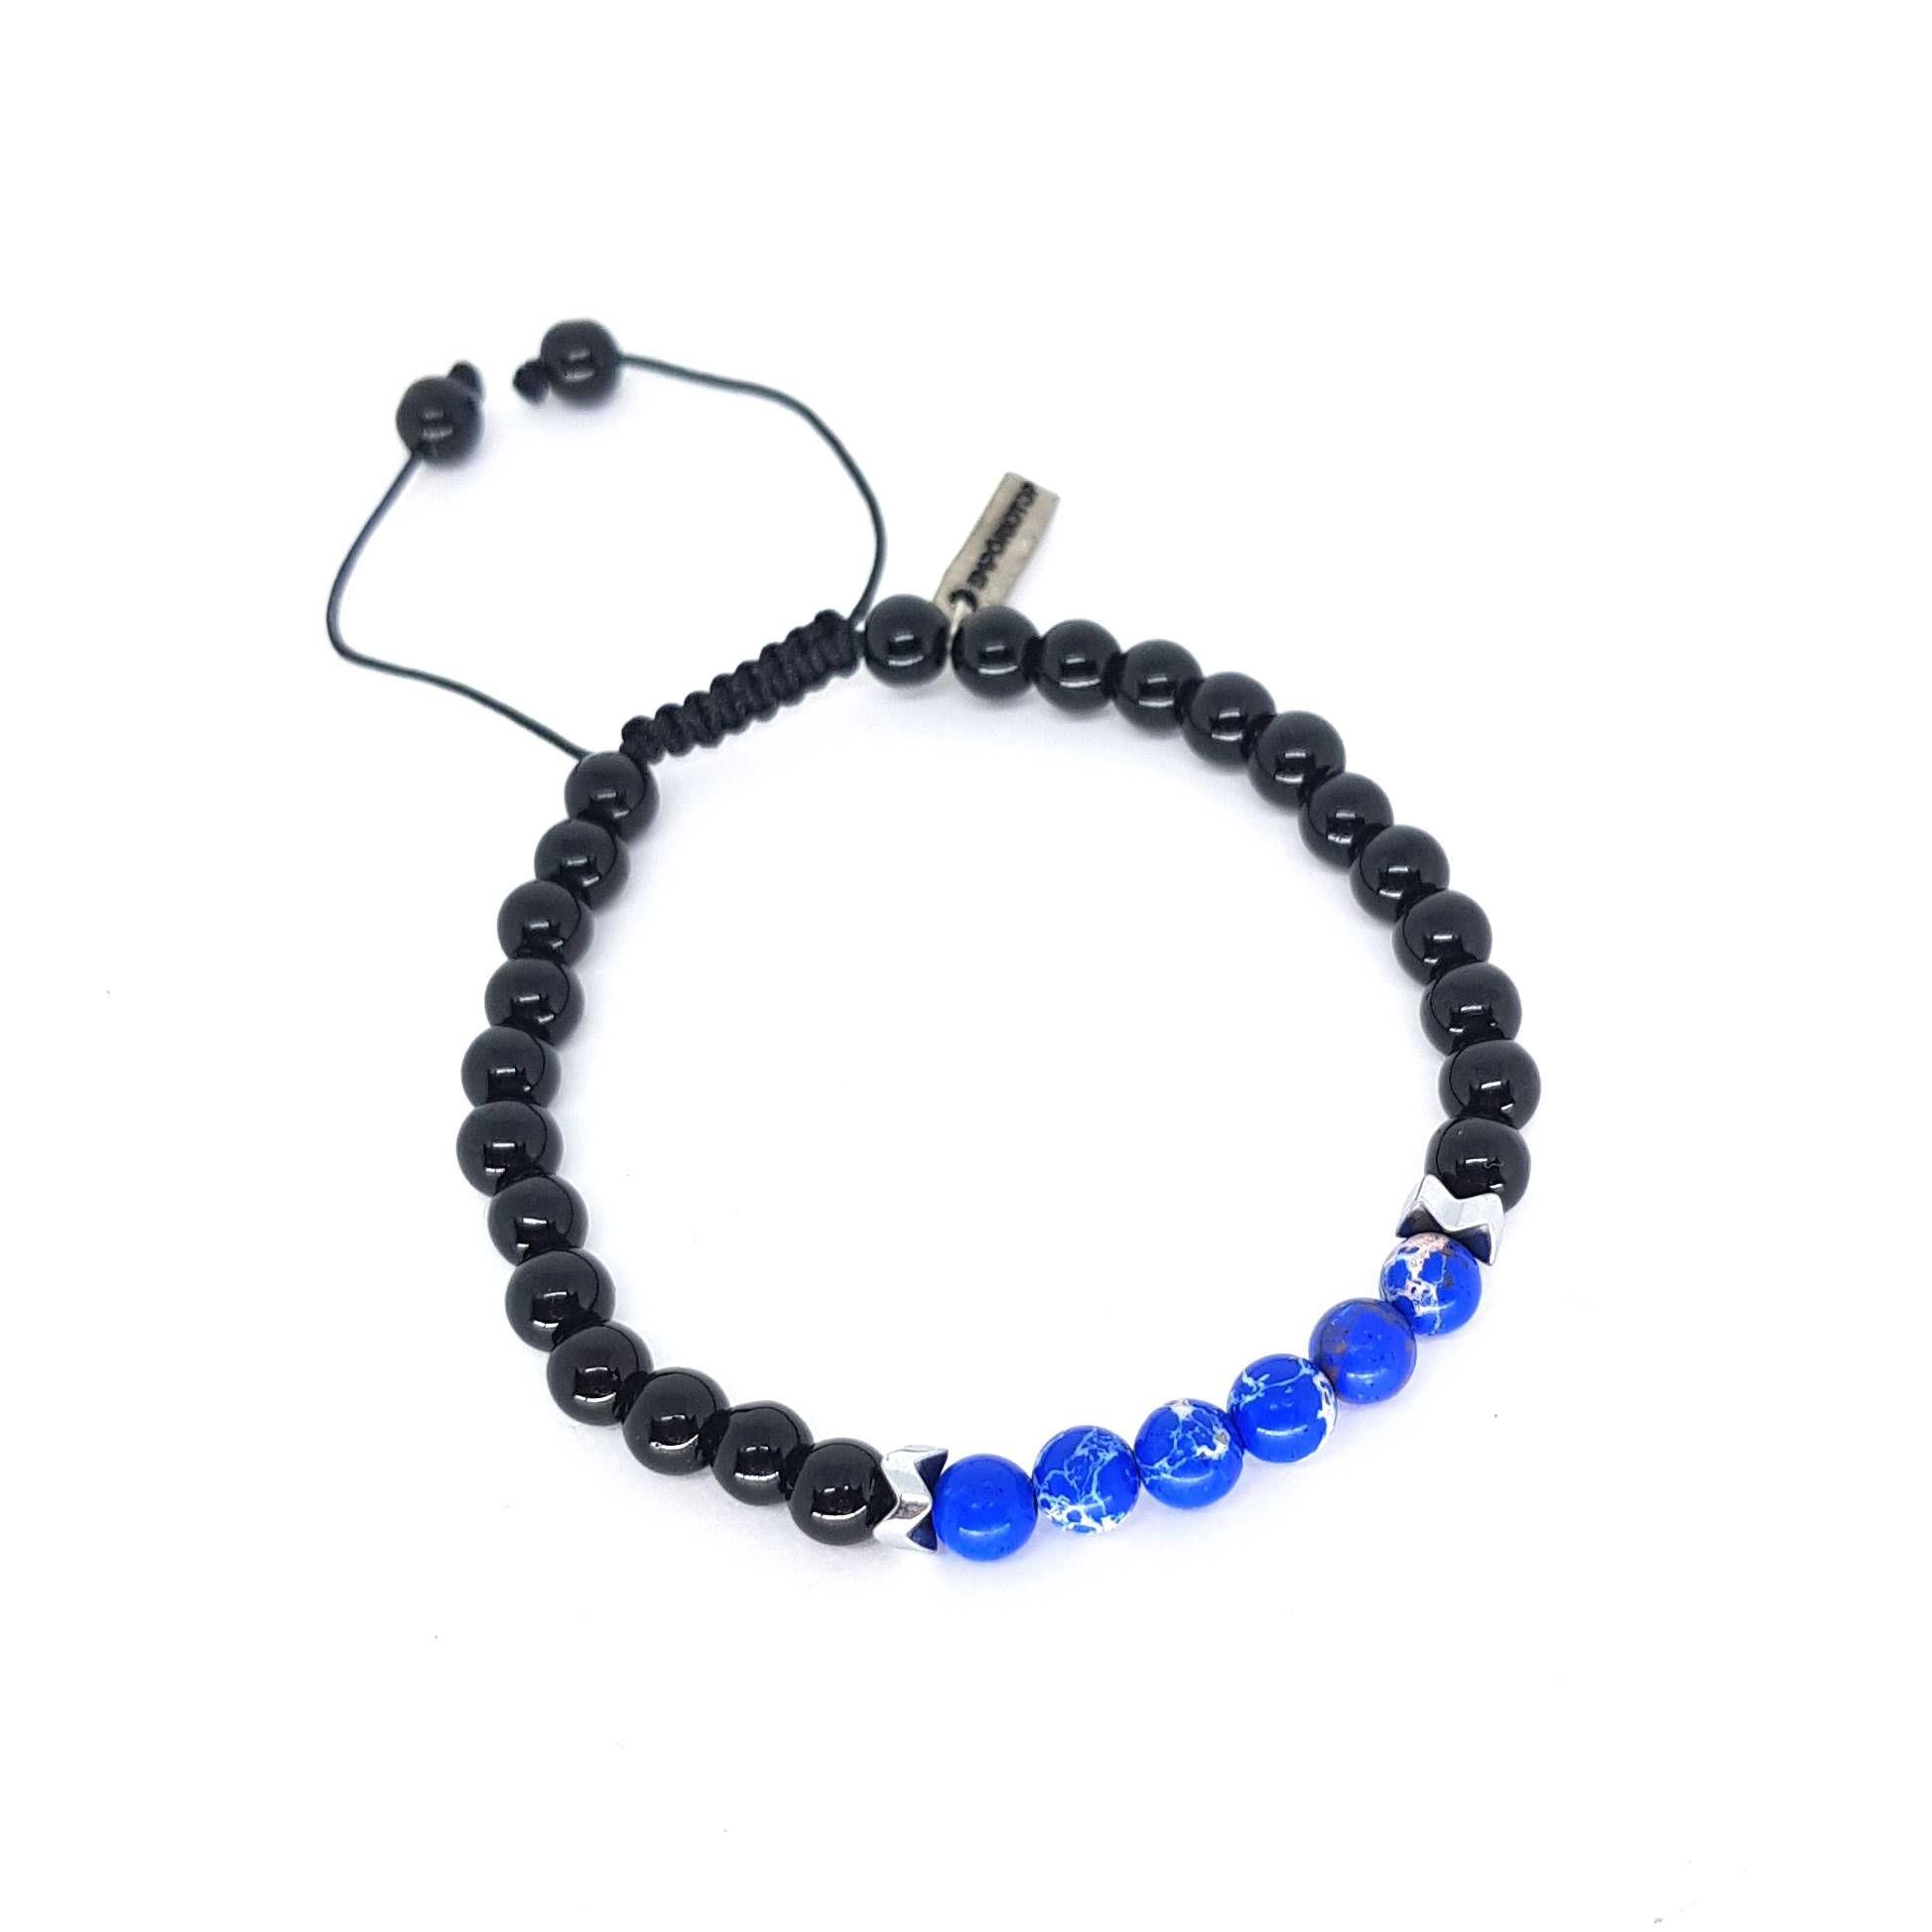 Pulseira Pedra Onix e Jasper Azul